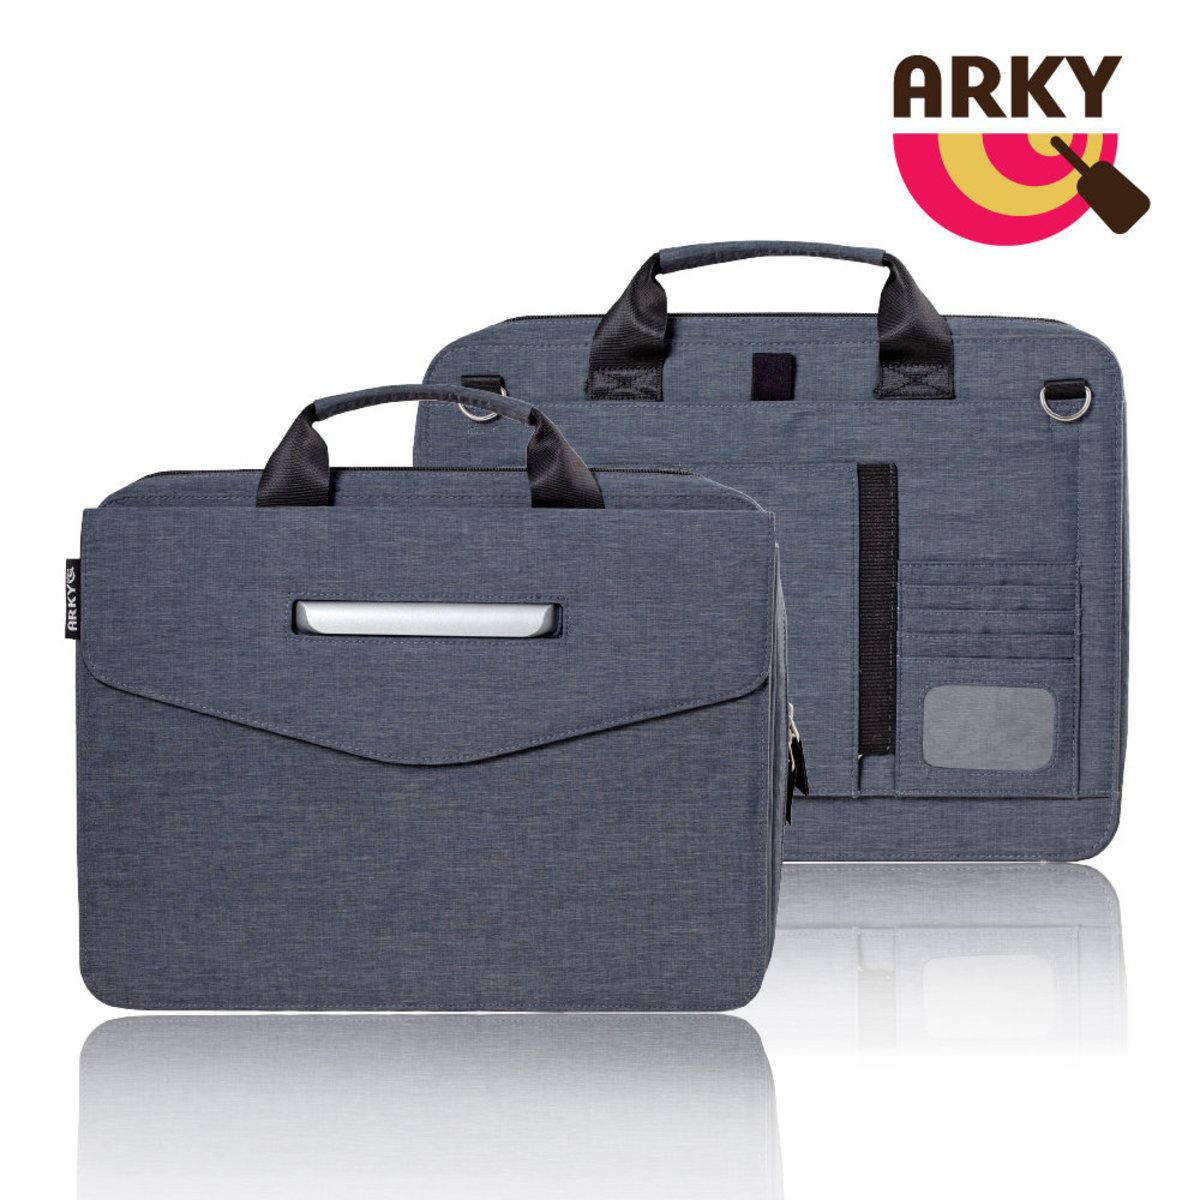 ARKY BoardPass Bag X USB gray